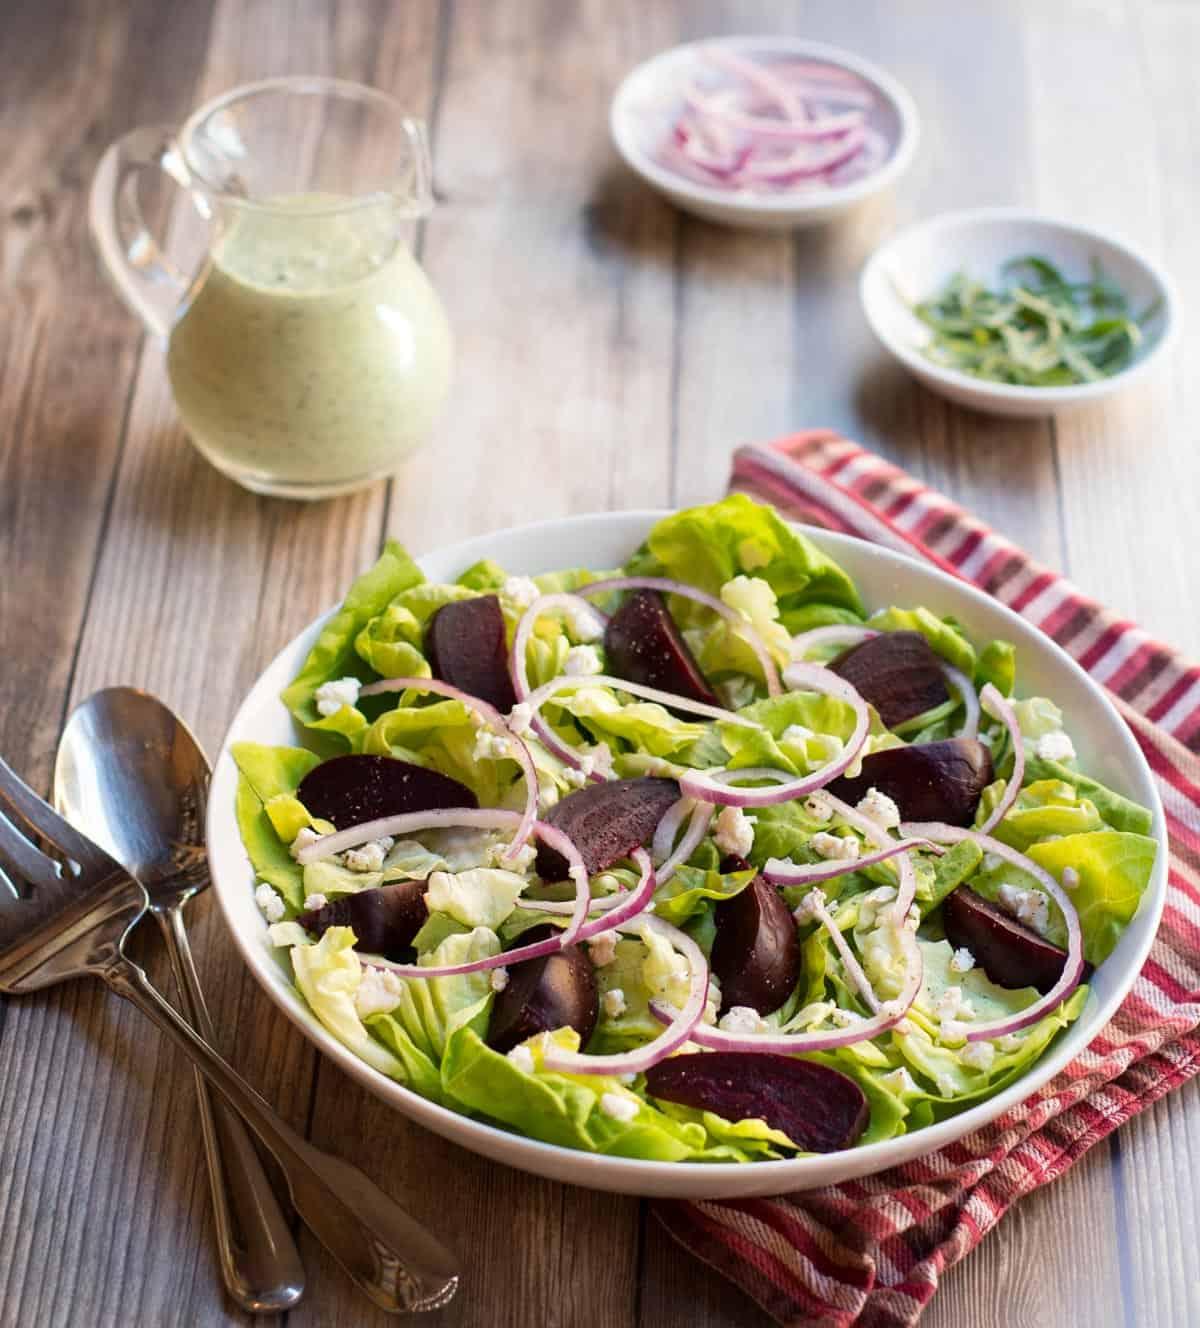 Roasted Beet Salad with Arugula Dressing on the side